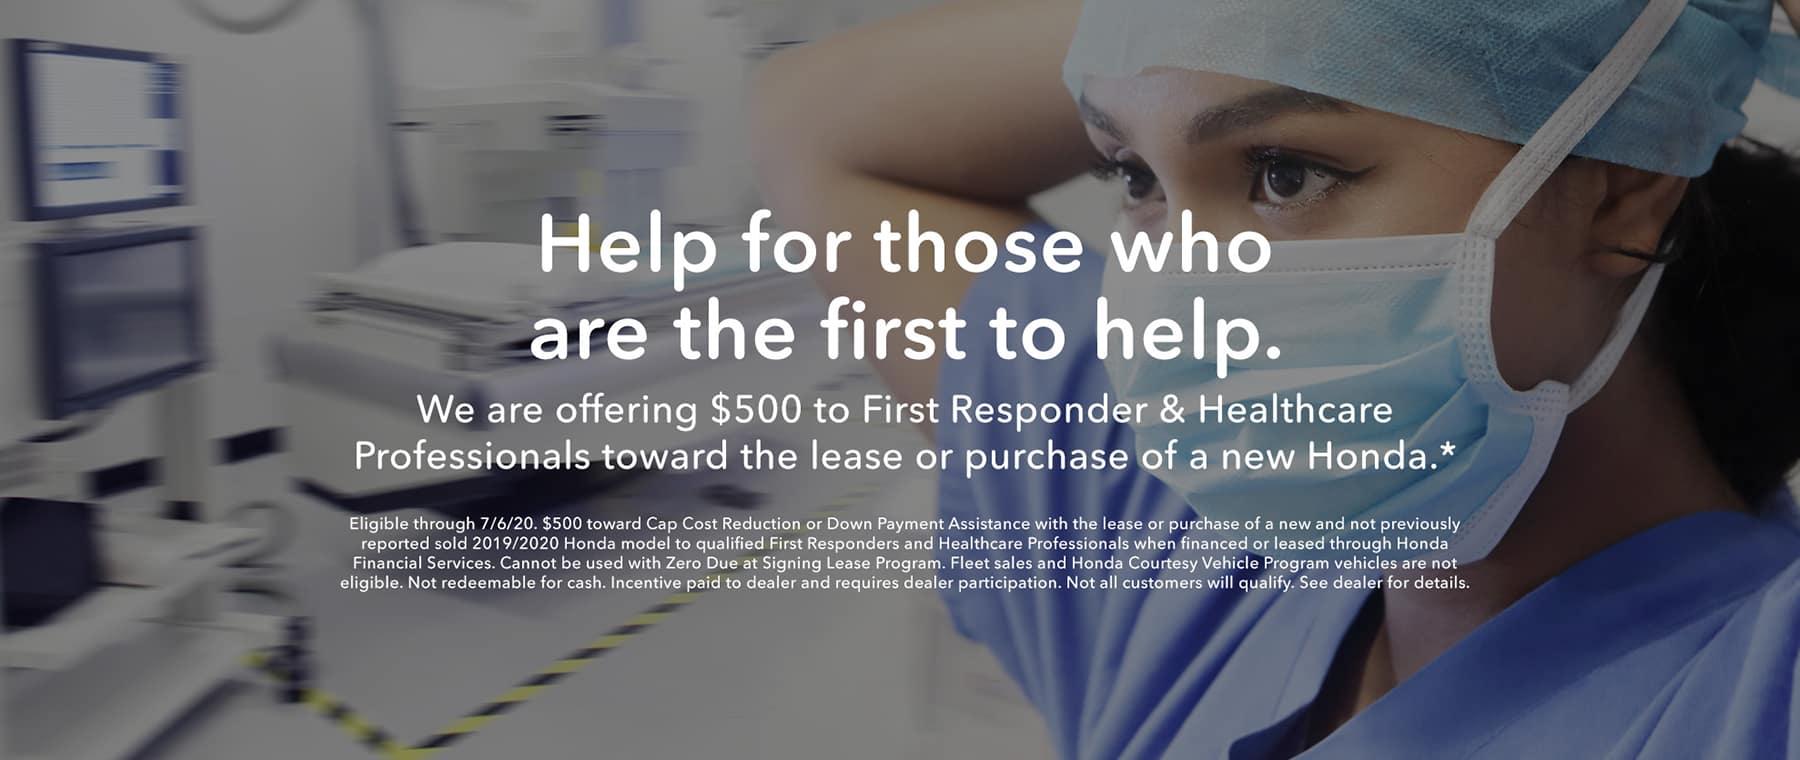 $500 First Responder & Healthcare Professional Appreciation Offer